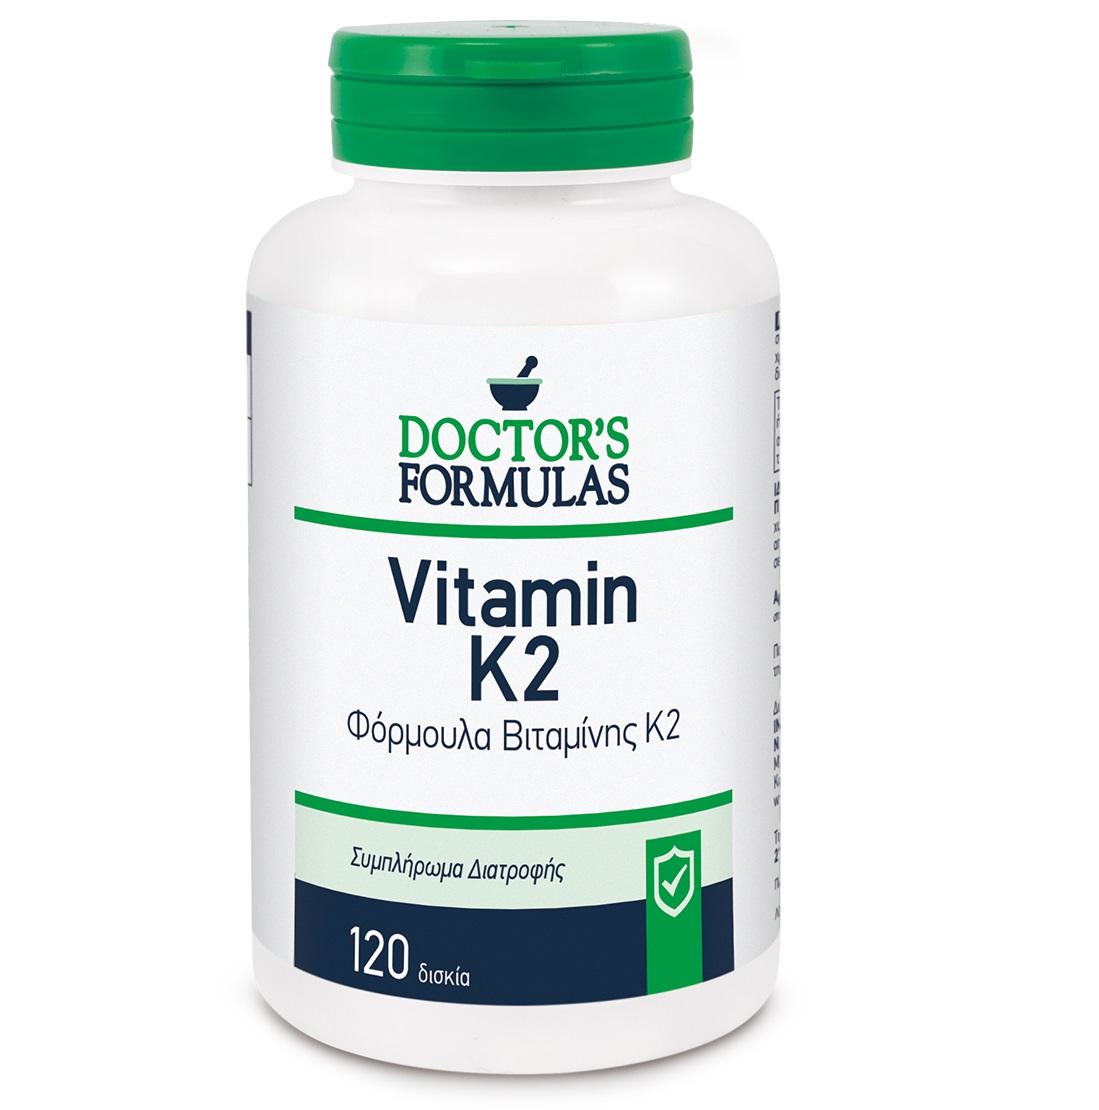 DOCTOR΄S FORMULAS Vitamin K2 120caps